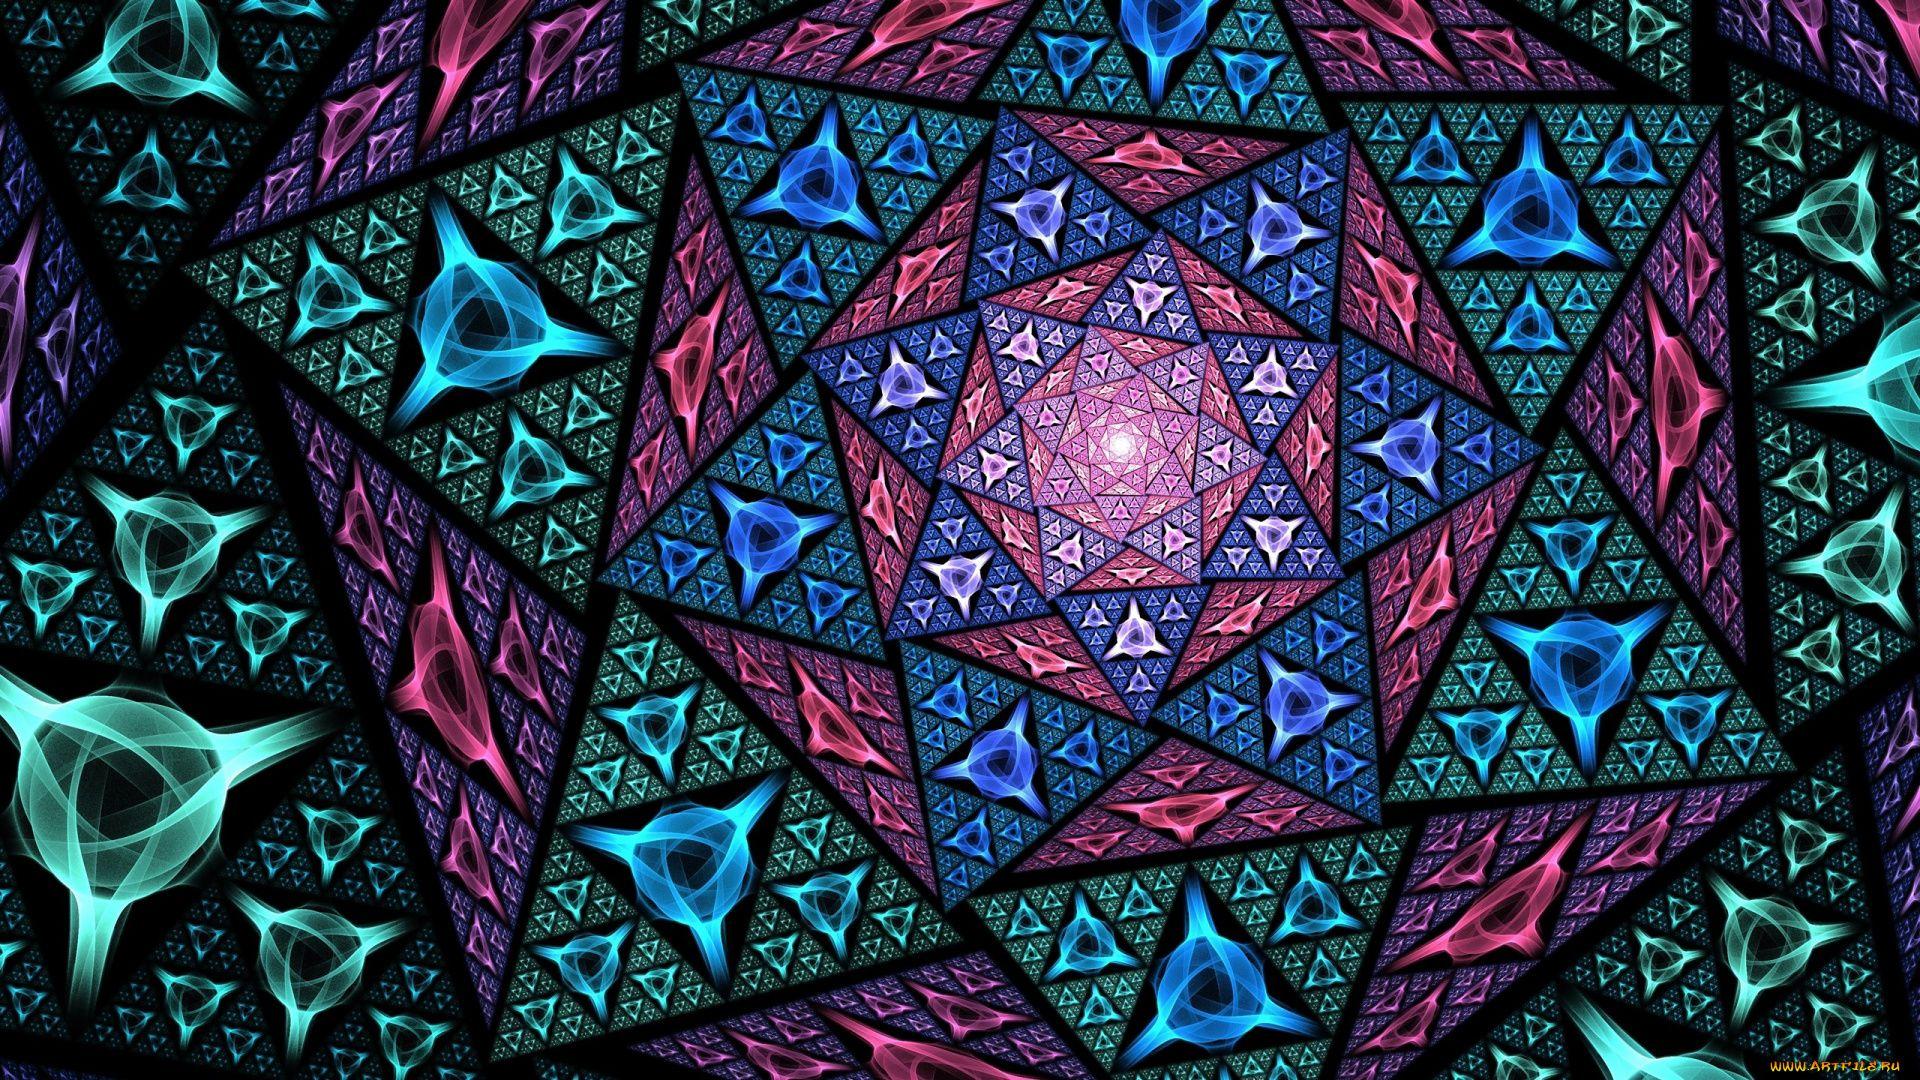 Kaleidoscope Picture